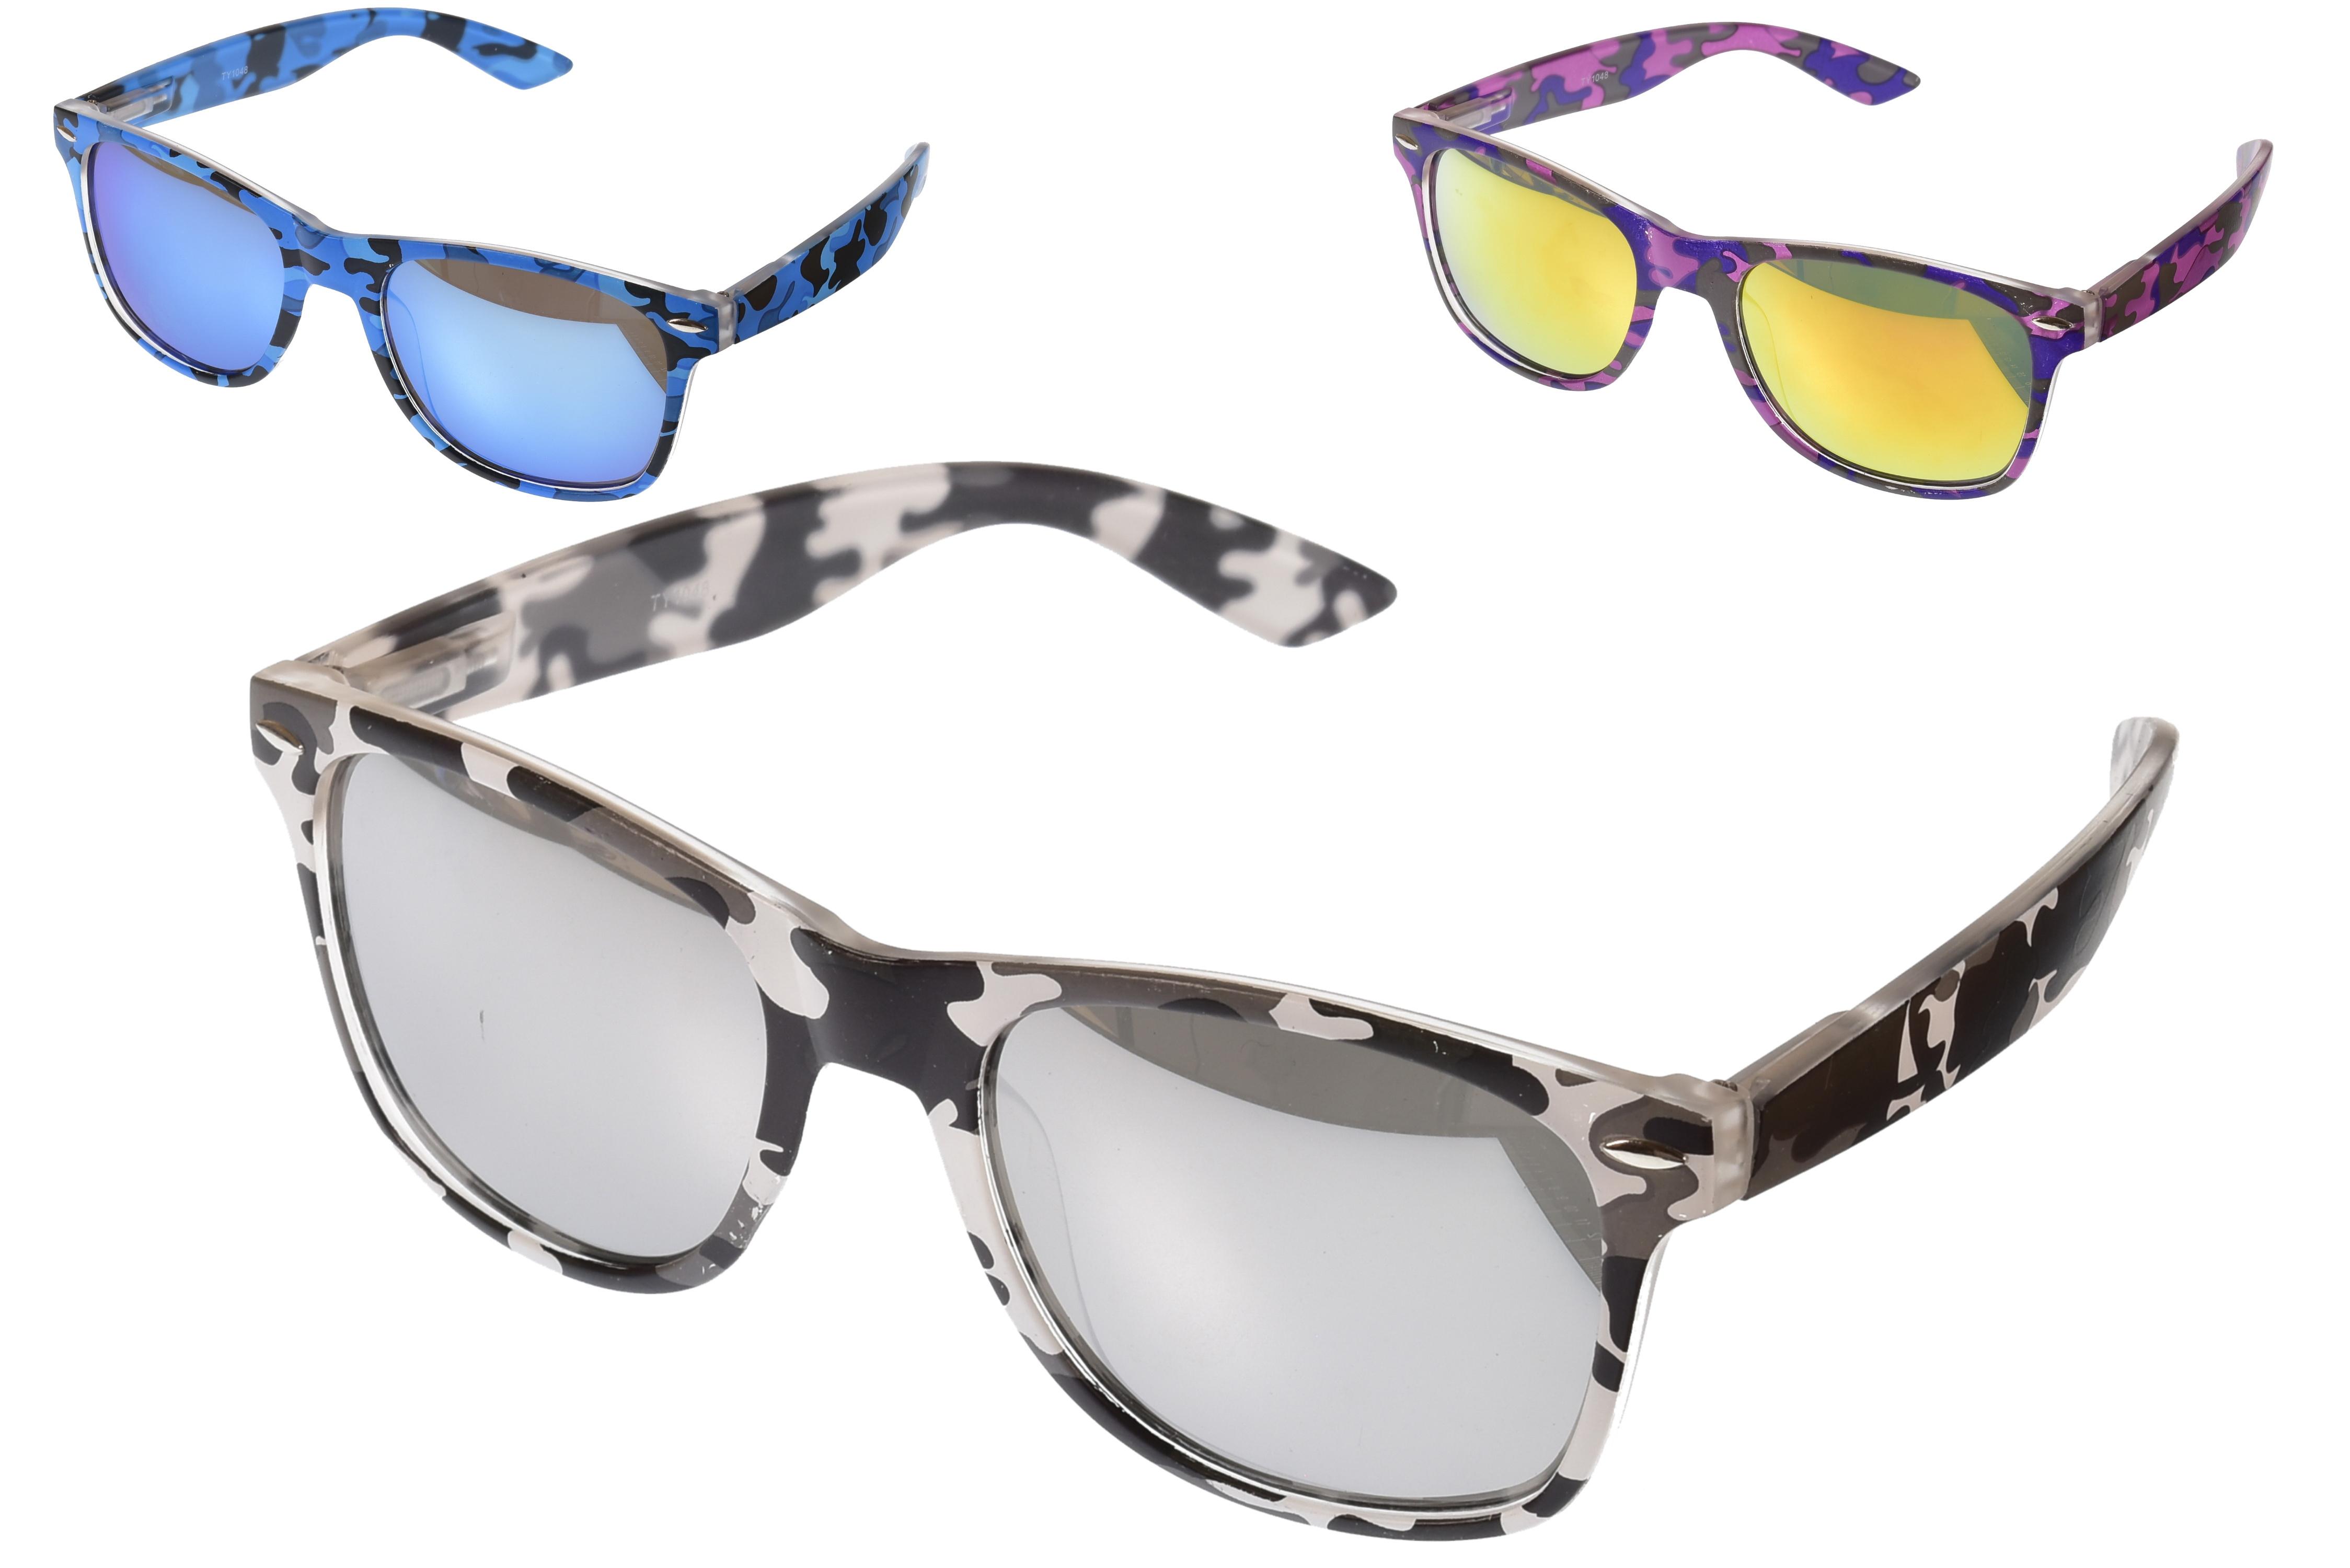 Adults Plastic Camouflage Print Sunglasses (3 Assorted)